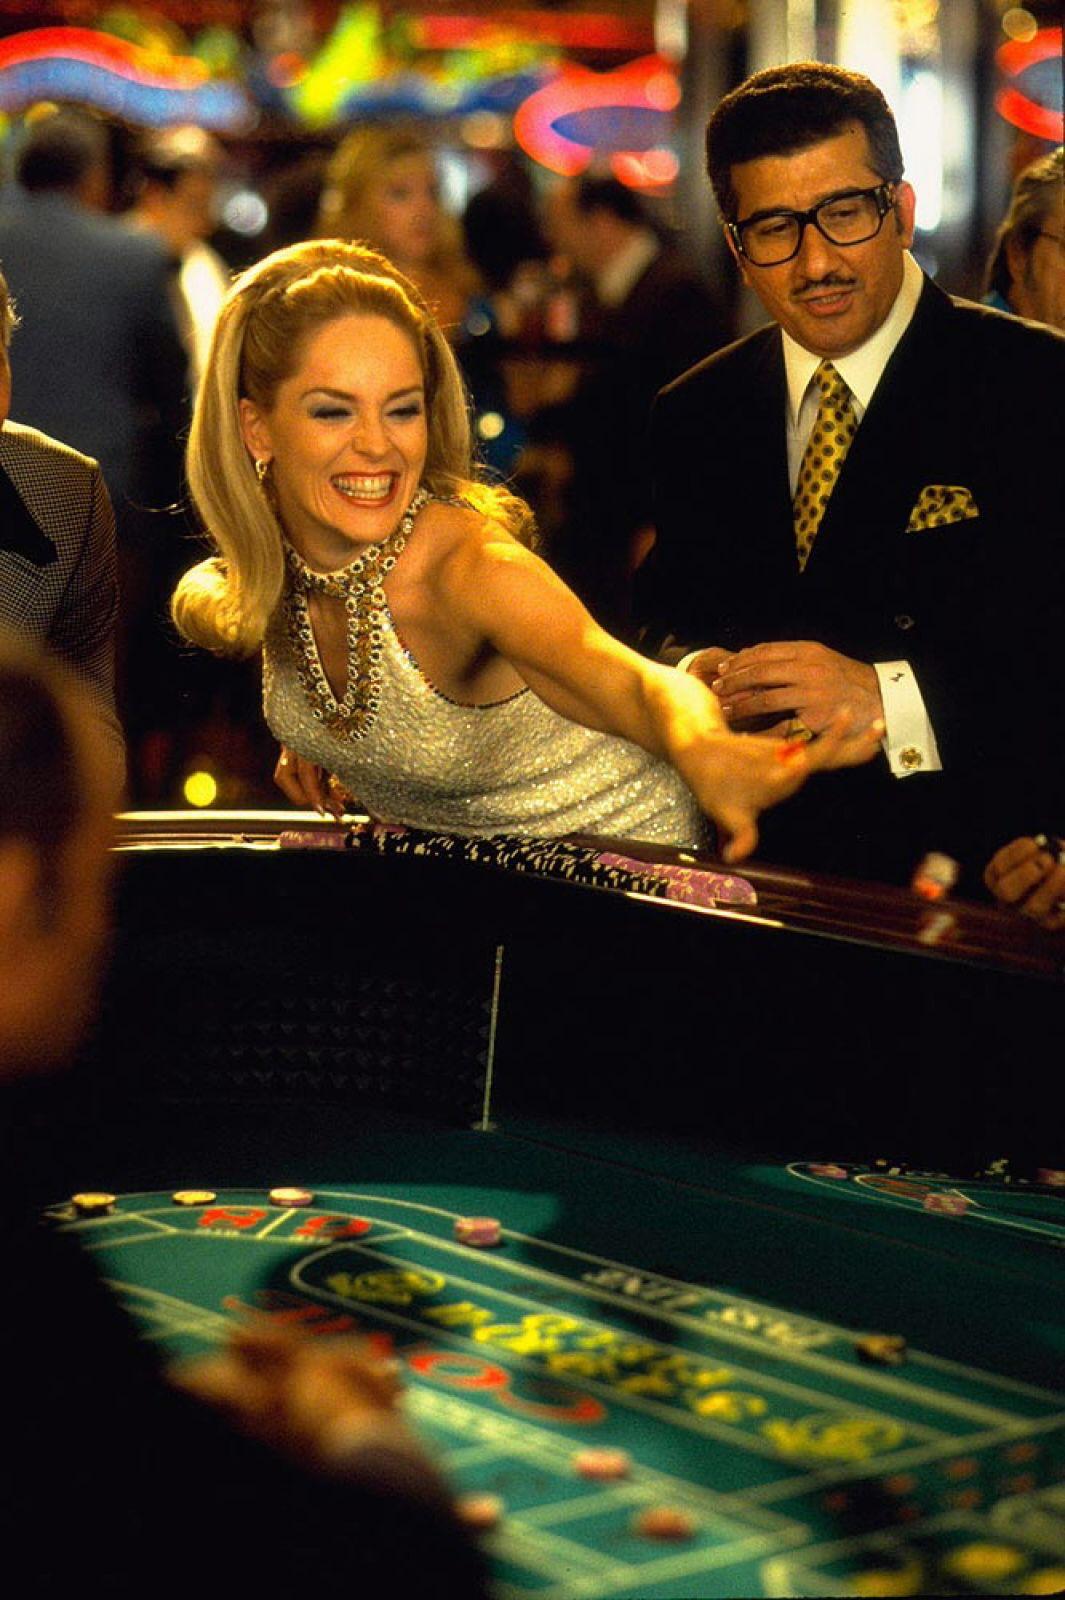 is gambling legal in alaska